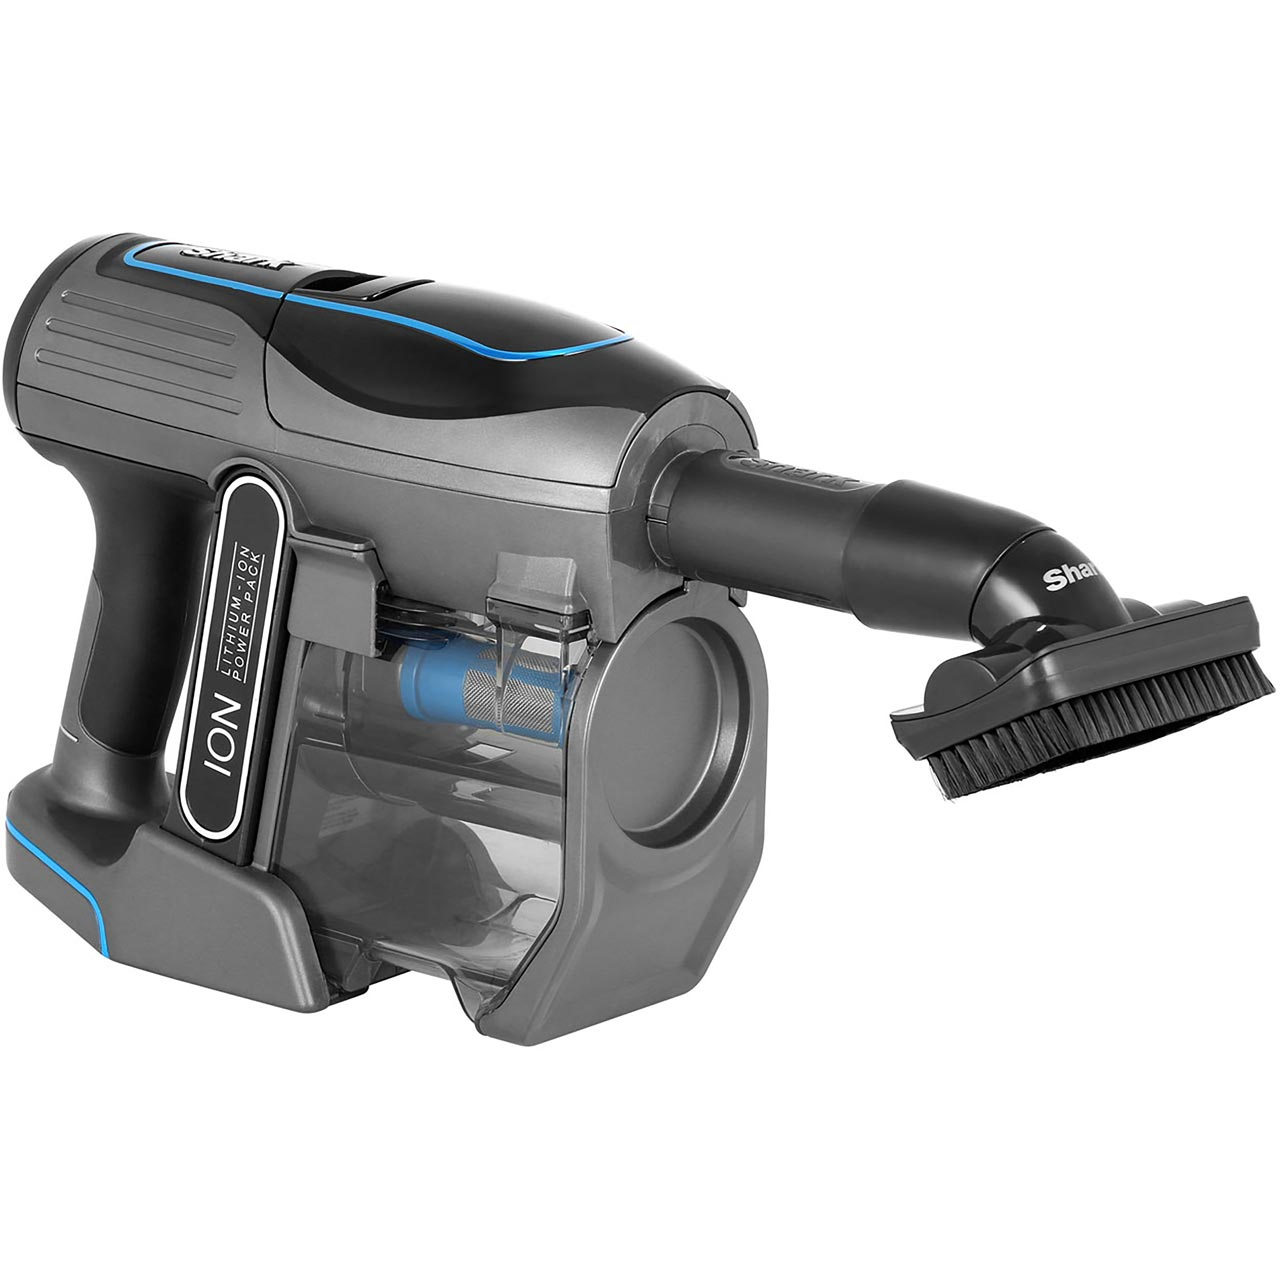 Shark If200uk Duoclean With Flexology Cordless Vacuum